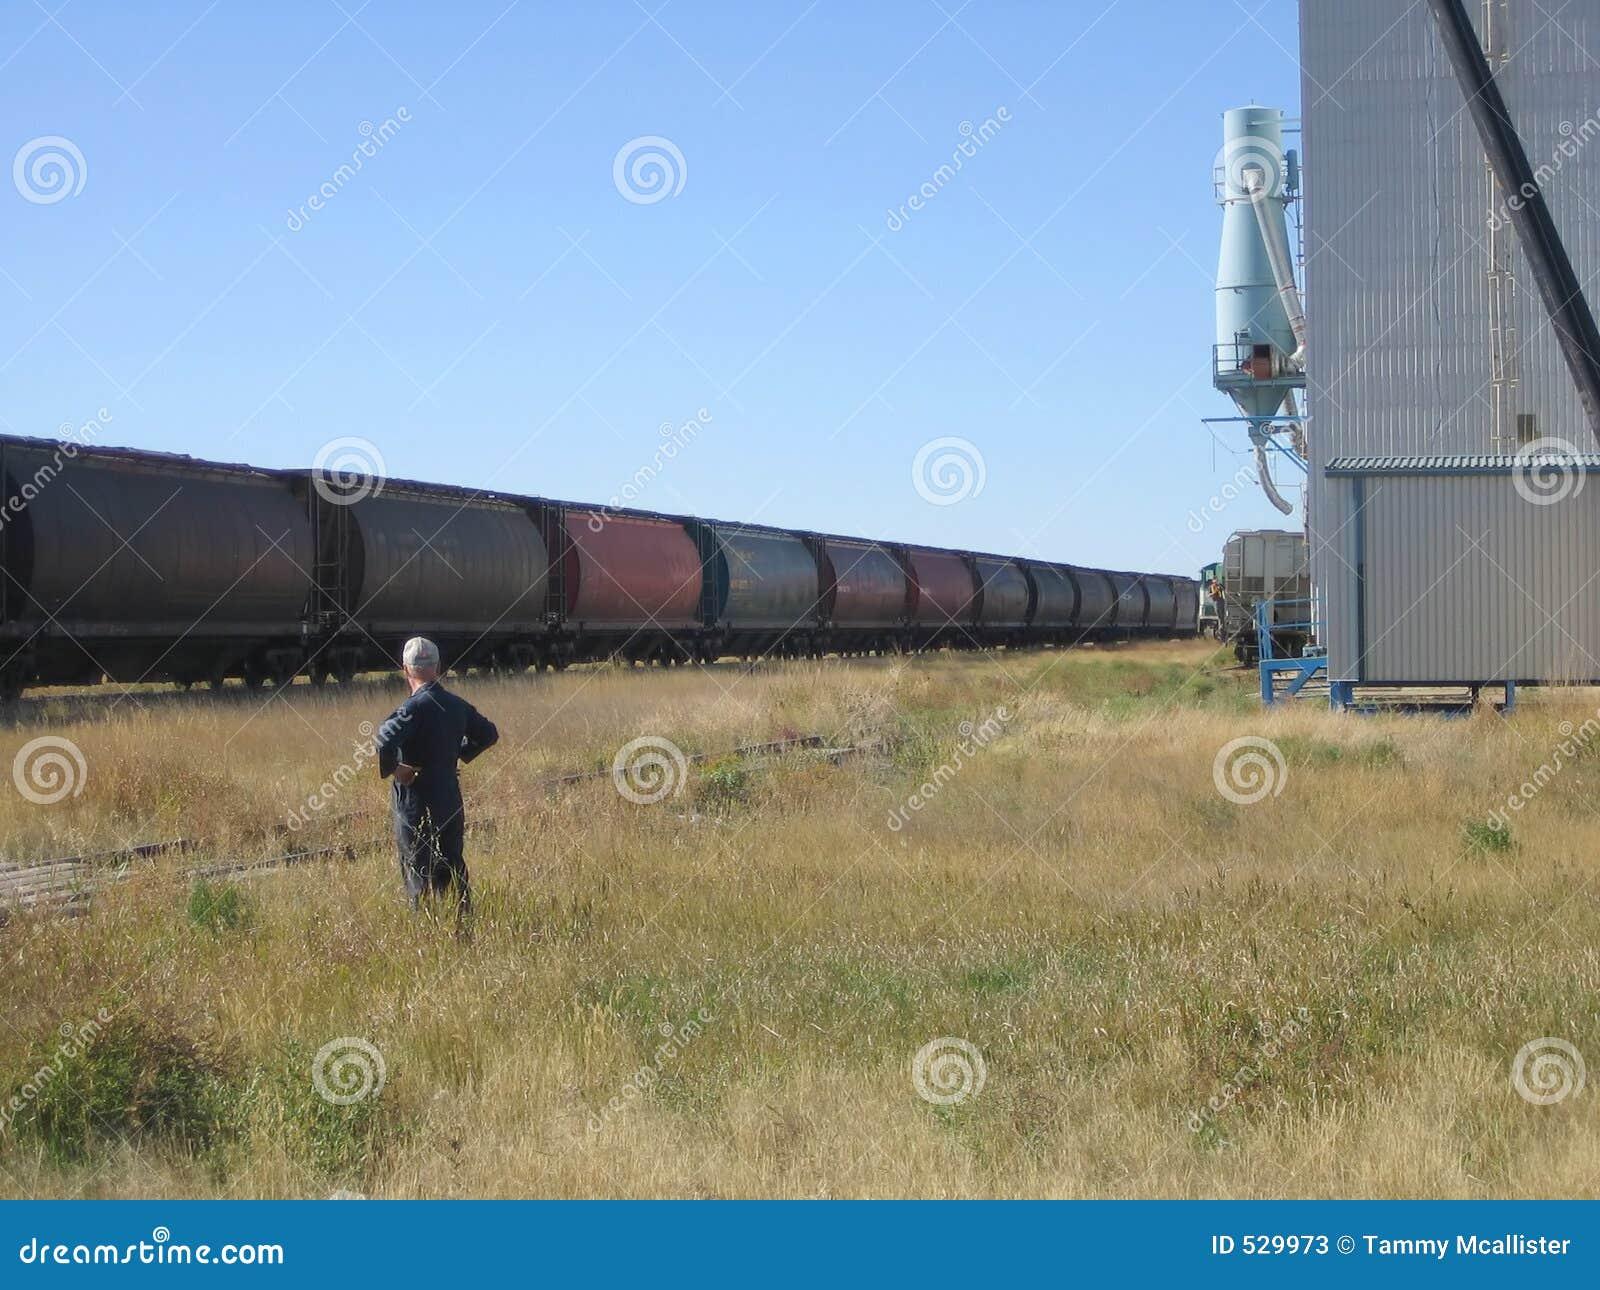 Download 汽车拉铁路运输注意 库存图片. 图片 包括有 谷物, 事假, 机车, 铁路, 行业, 生产, 铁路运输, 岗位 - 529973